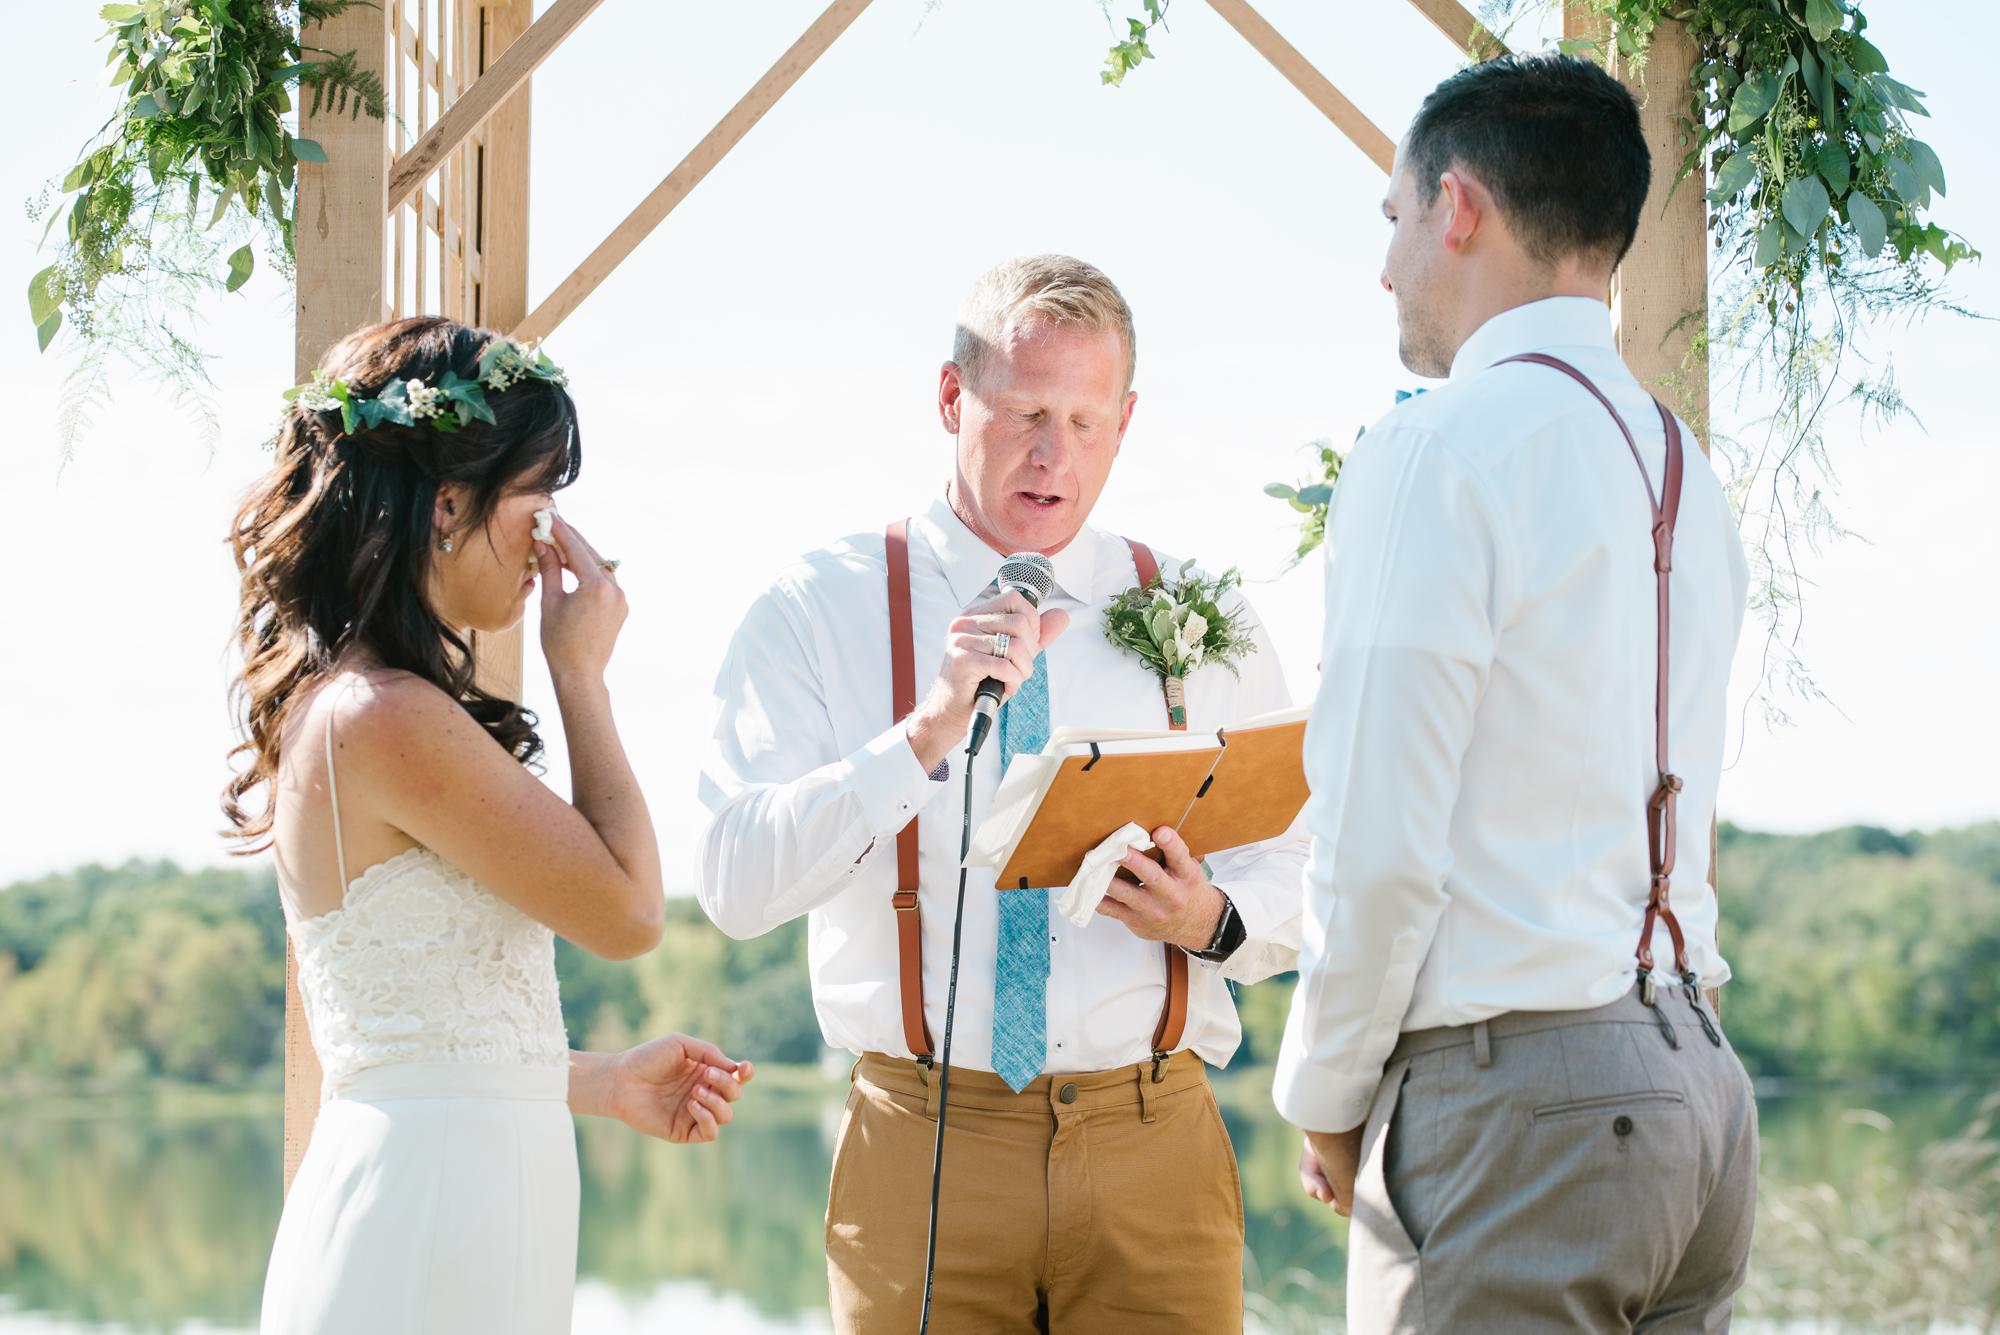 Quincy-Coldwater-Michigan-farm-wedding-photogapher-sydney-marie (160).jpg